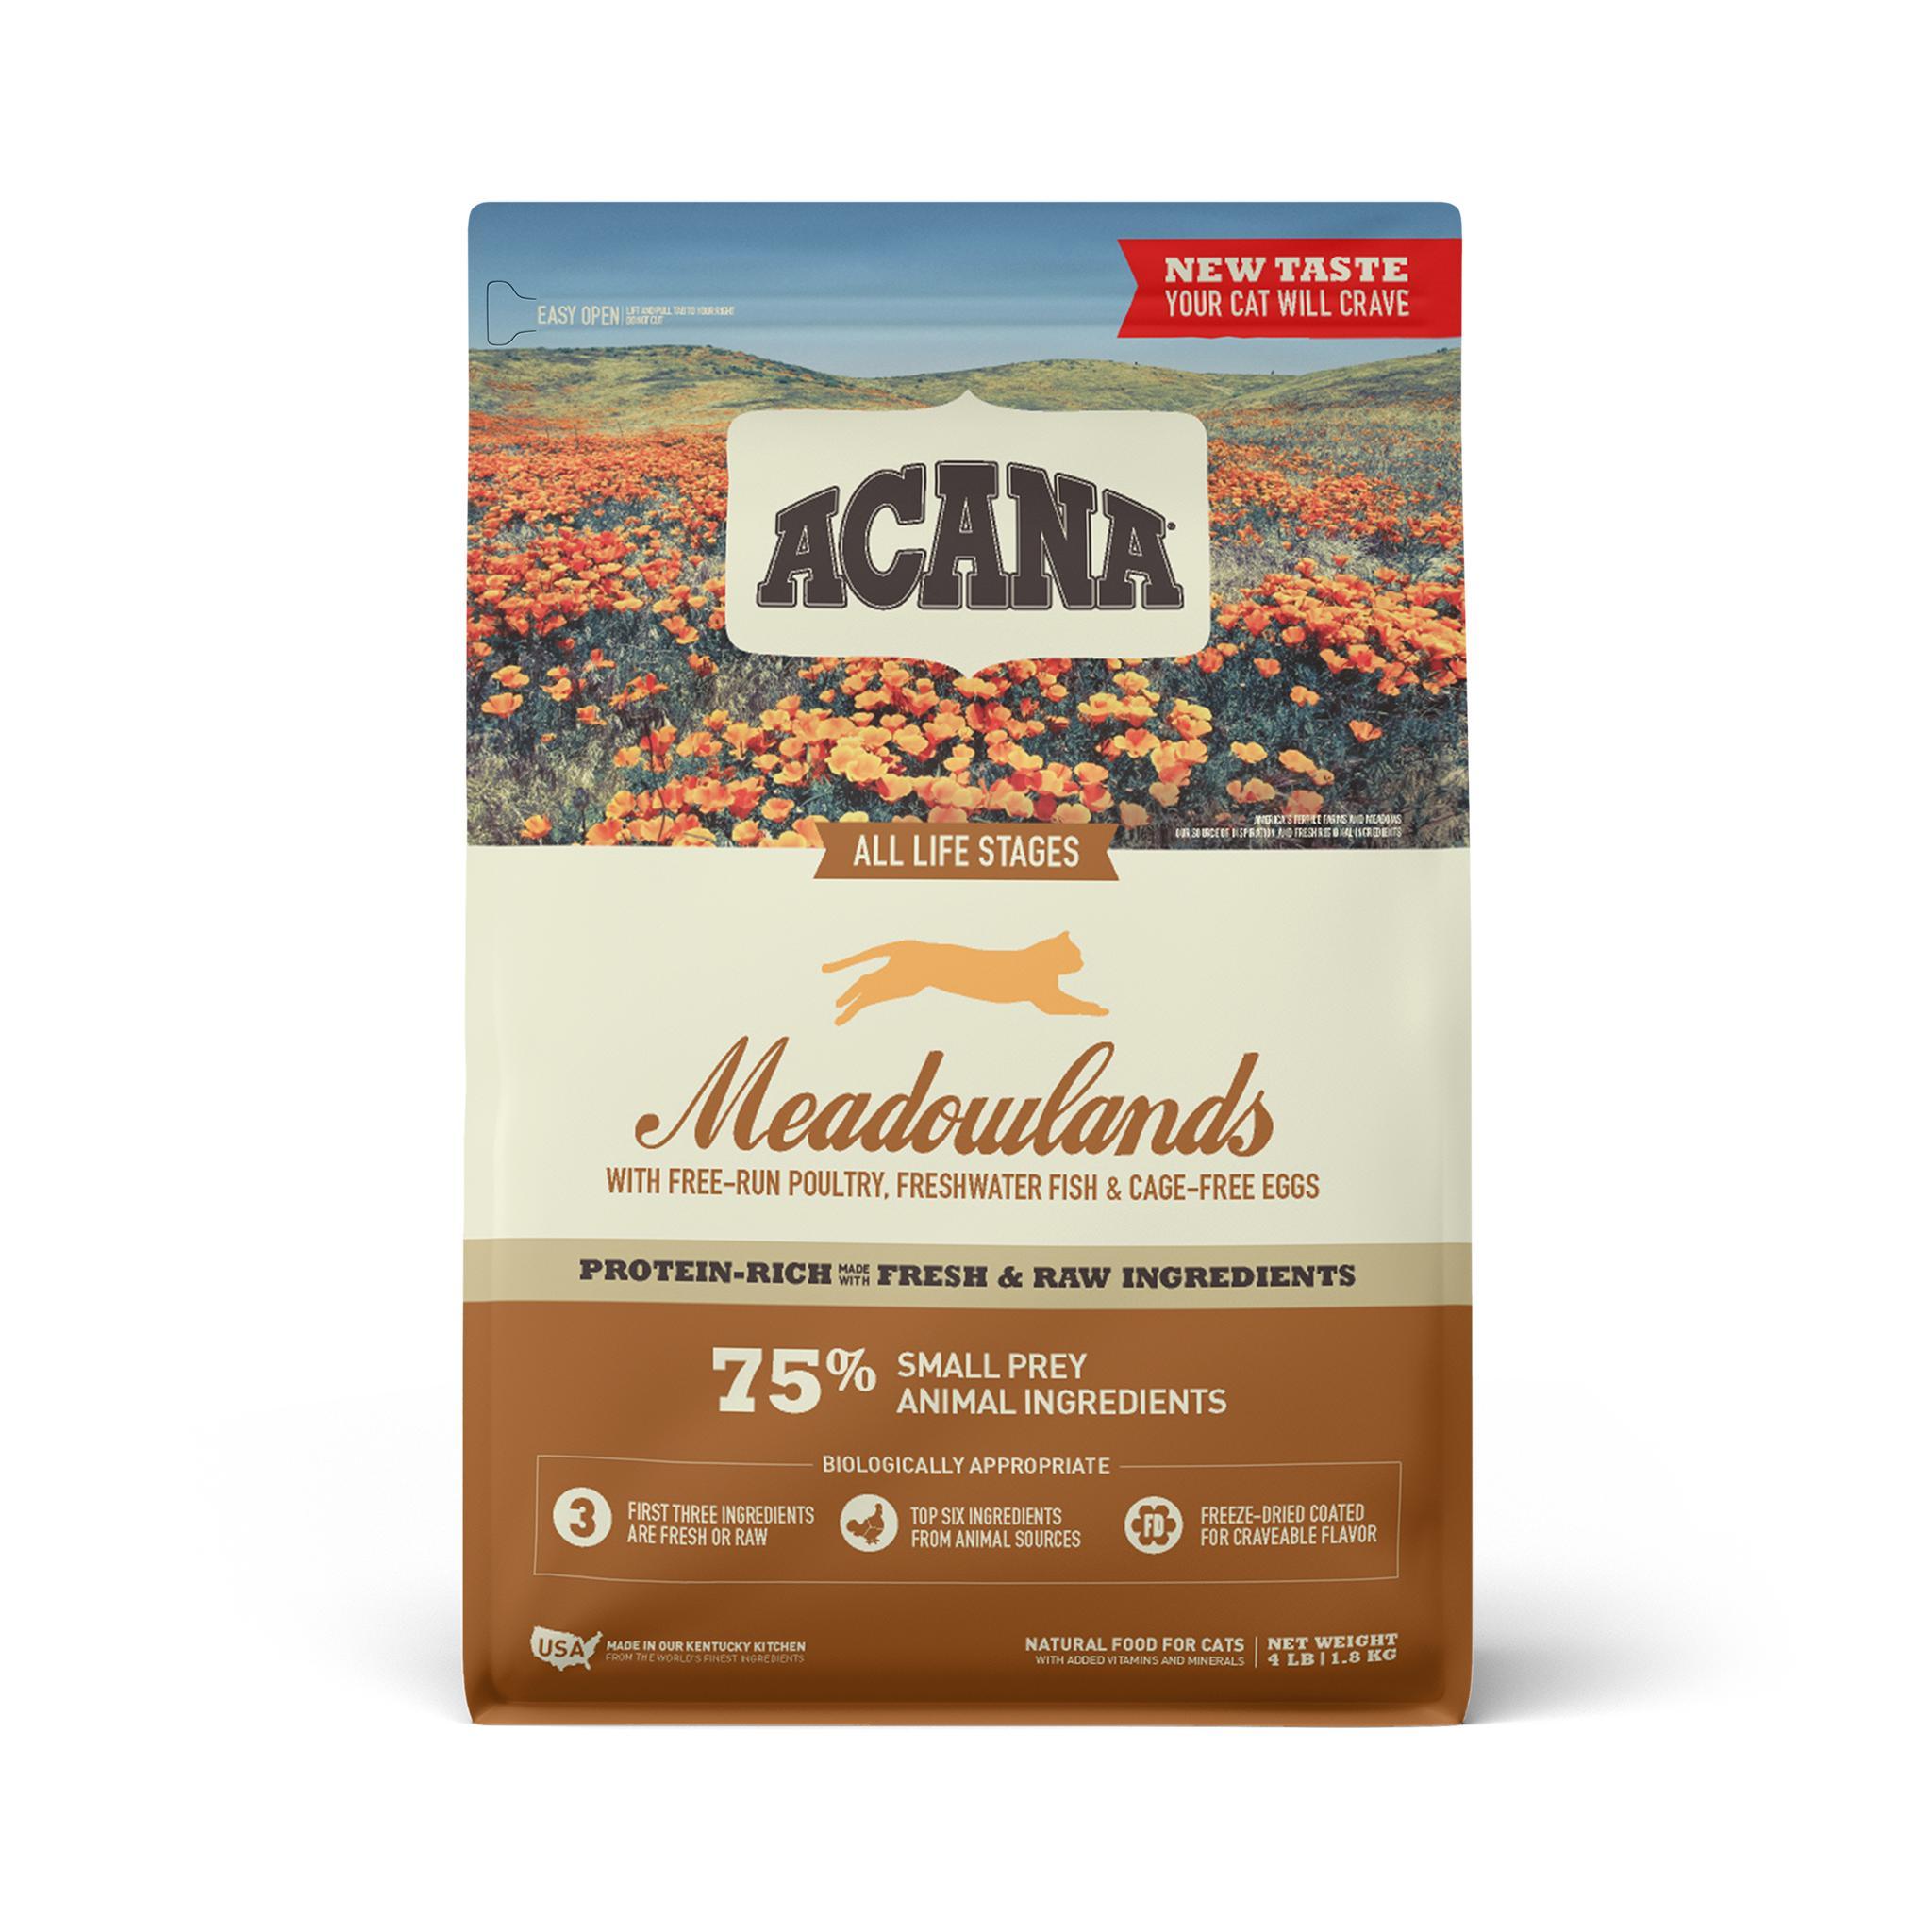 ACANA Meadowlands Grain-Free Dry Cat Food, 4-lb bag